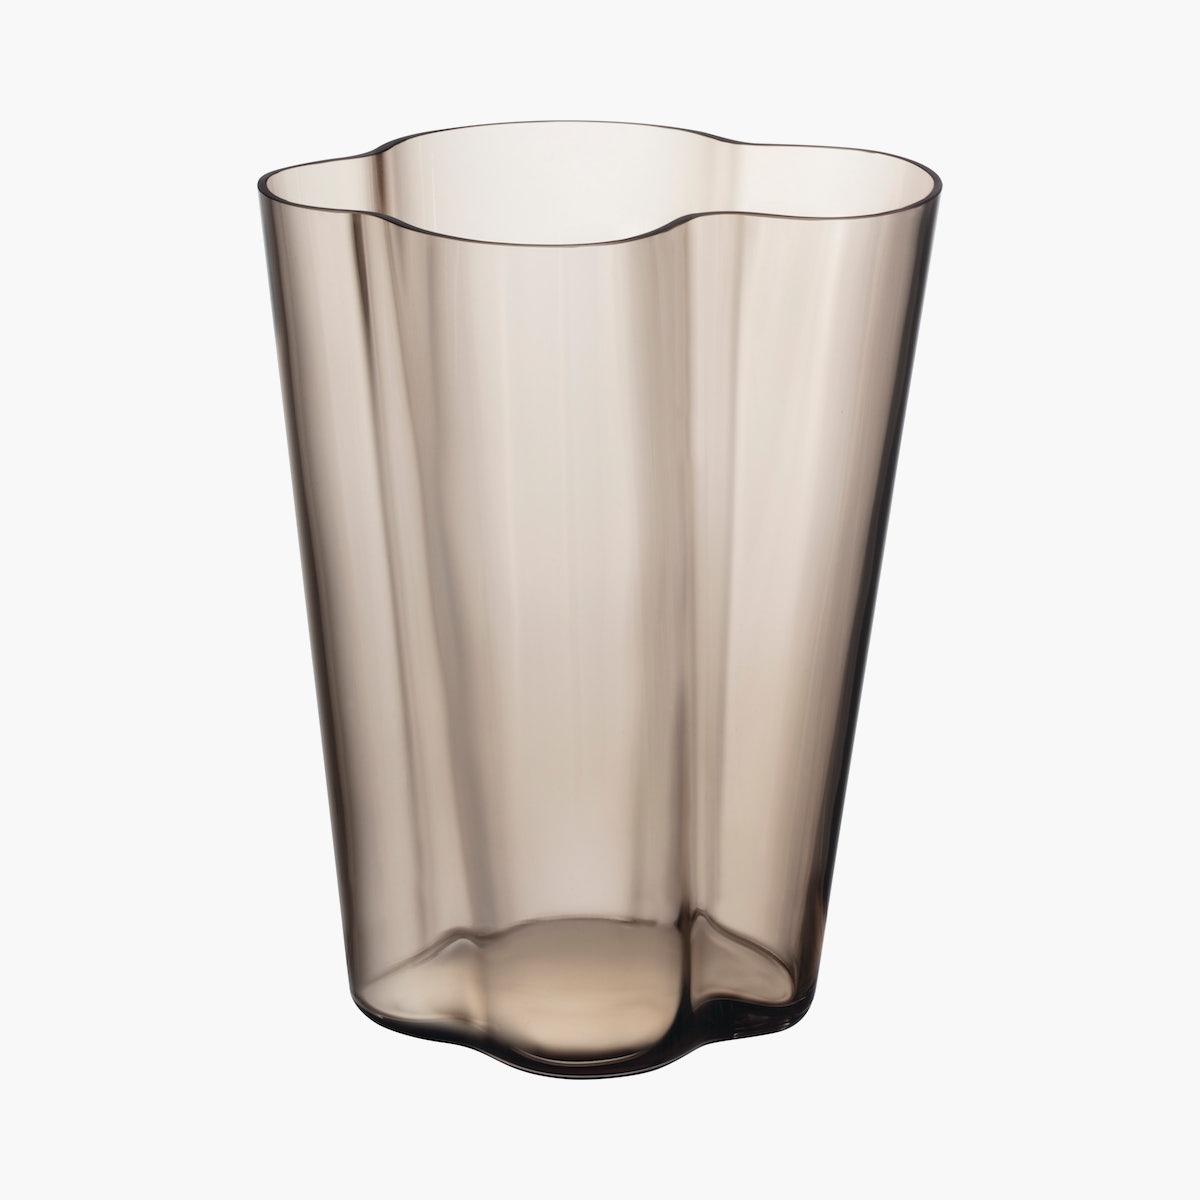 Aalto Finlandia Vase